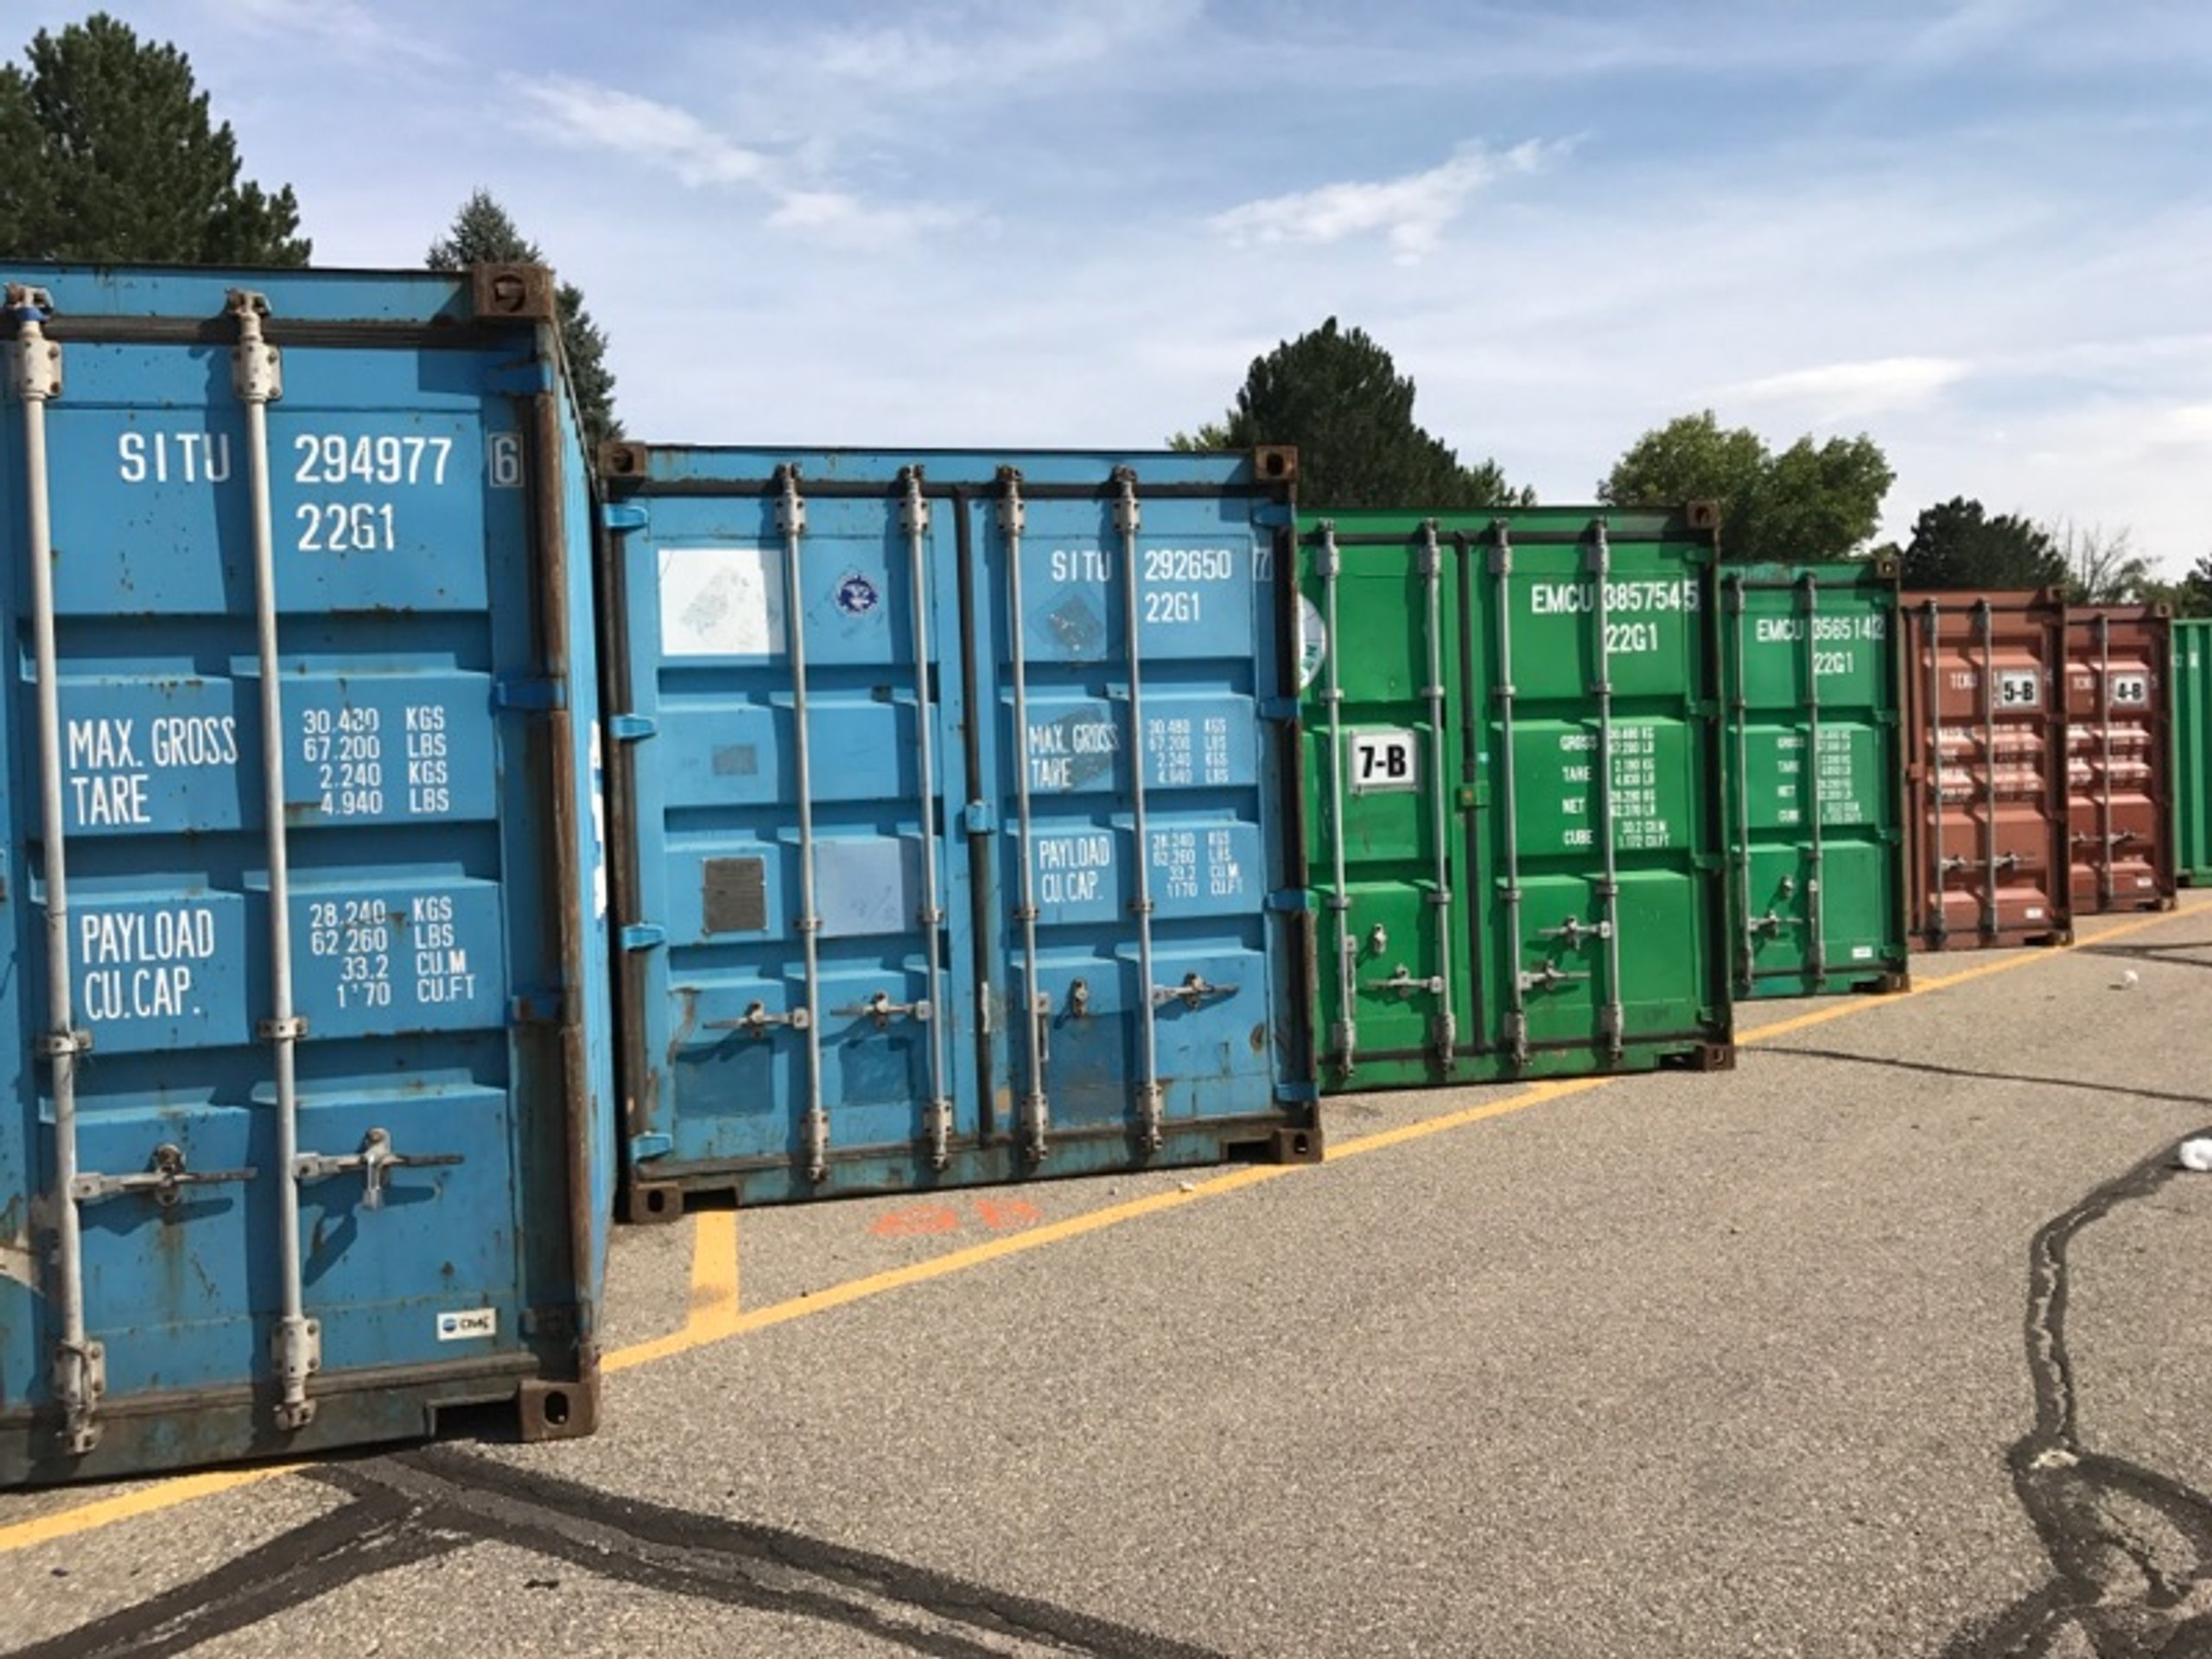 25x10 Parking Lot self storage unit